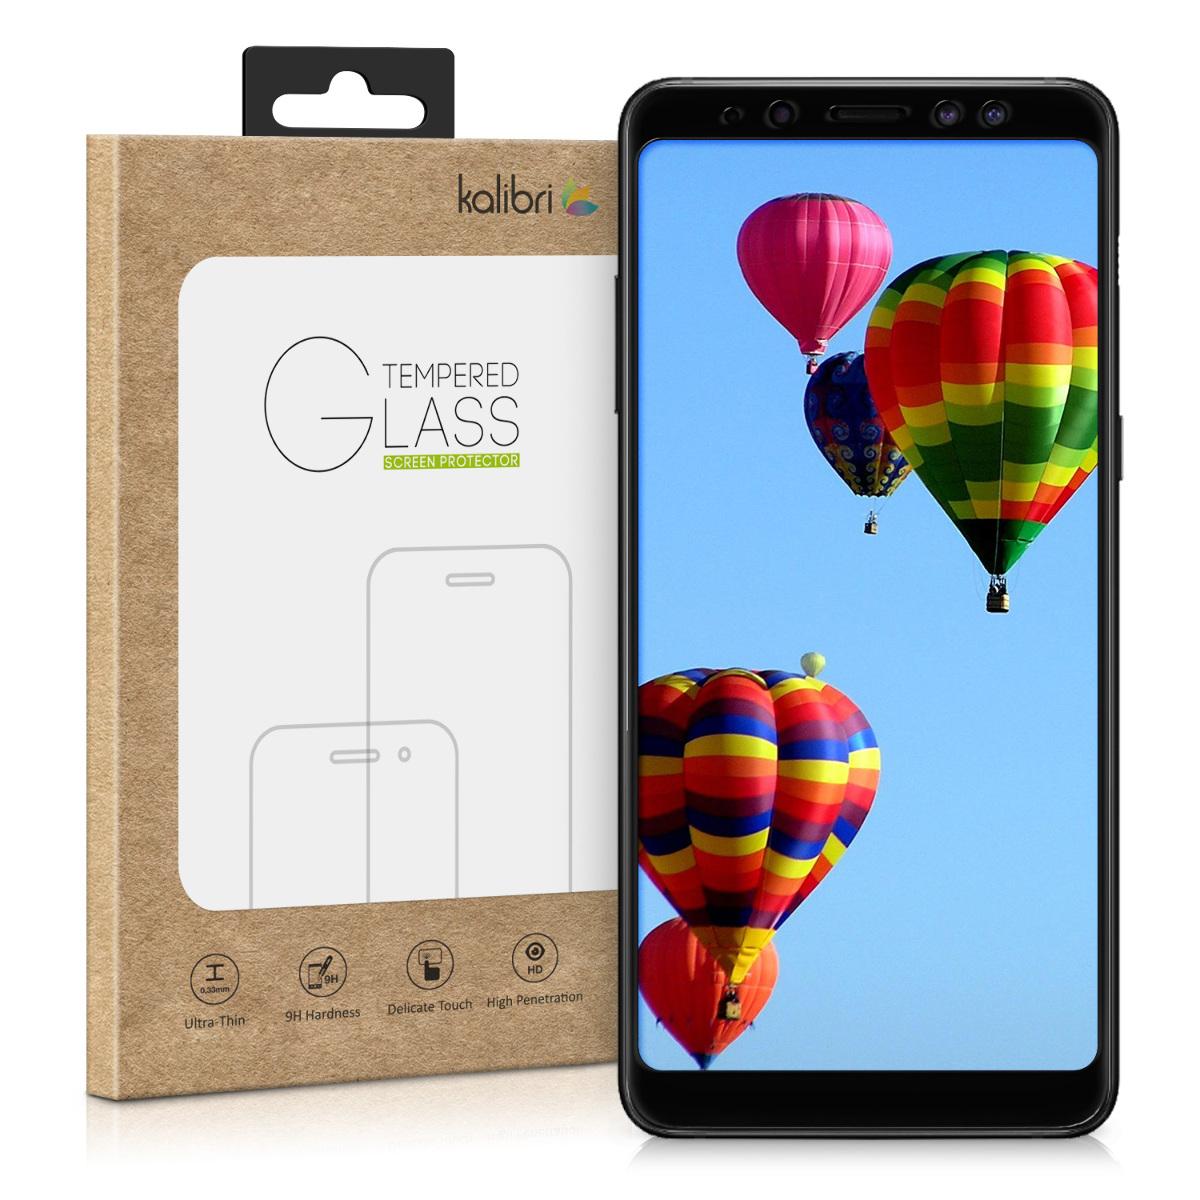 Kalibri Tempered Glass - Fullface Αντιχαρακτικό Γυαλί Οθόνης Samsung Galaxy A8 2018 - Black (44457.01)